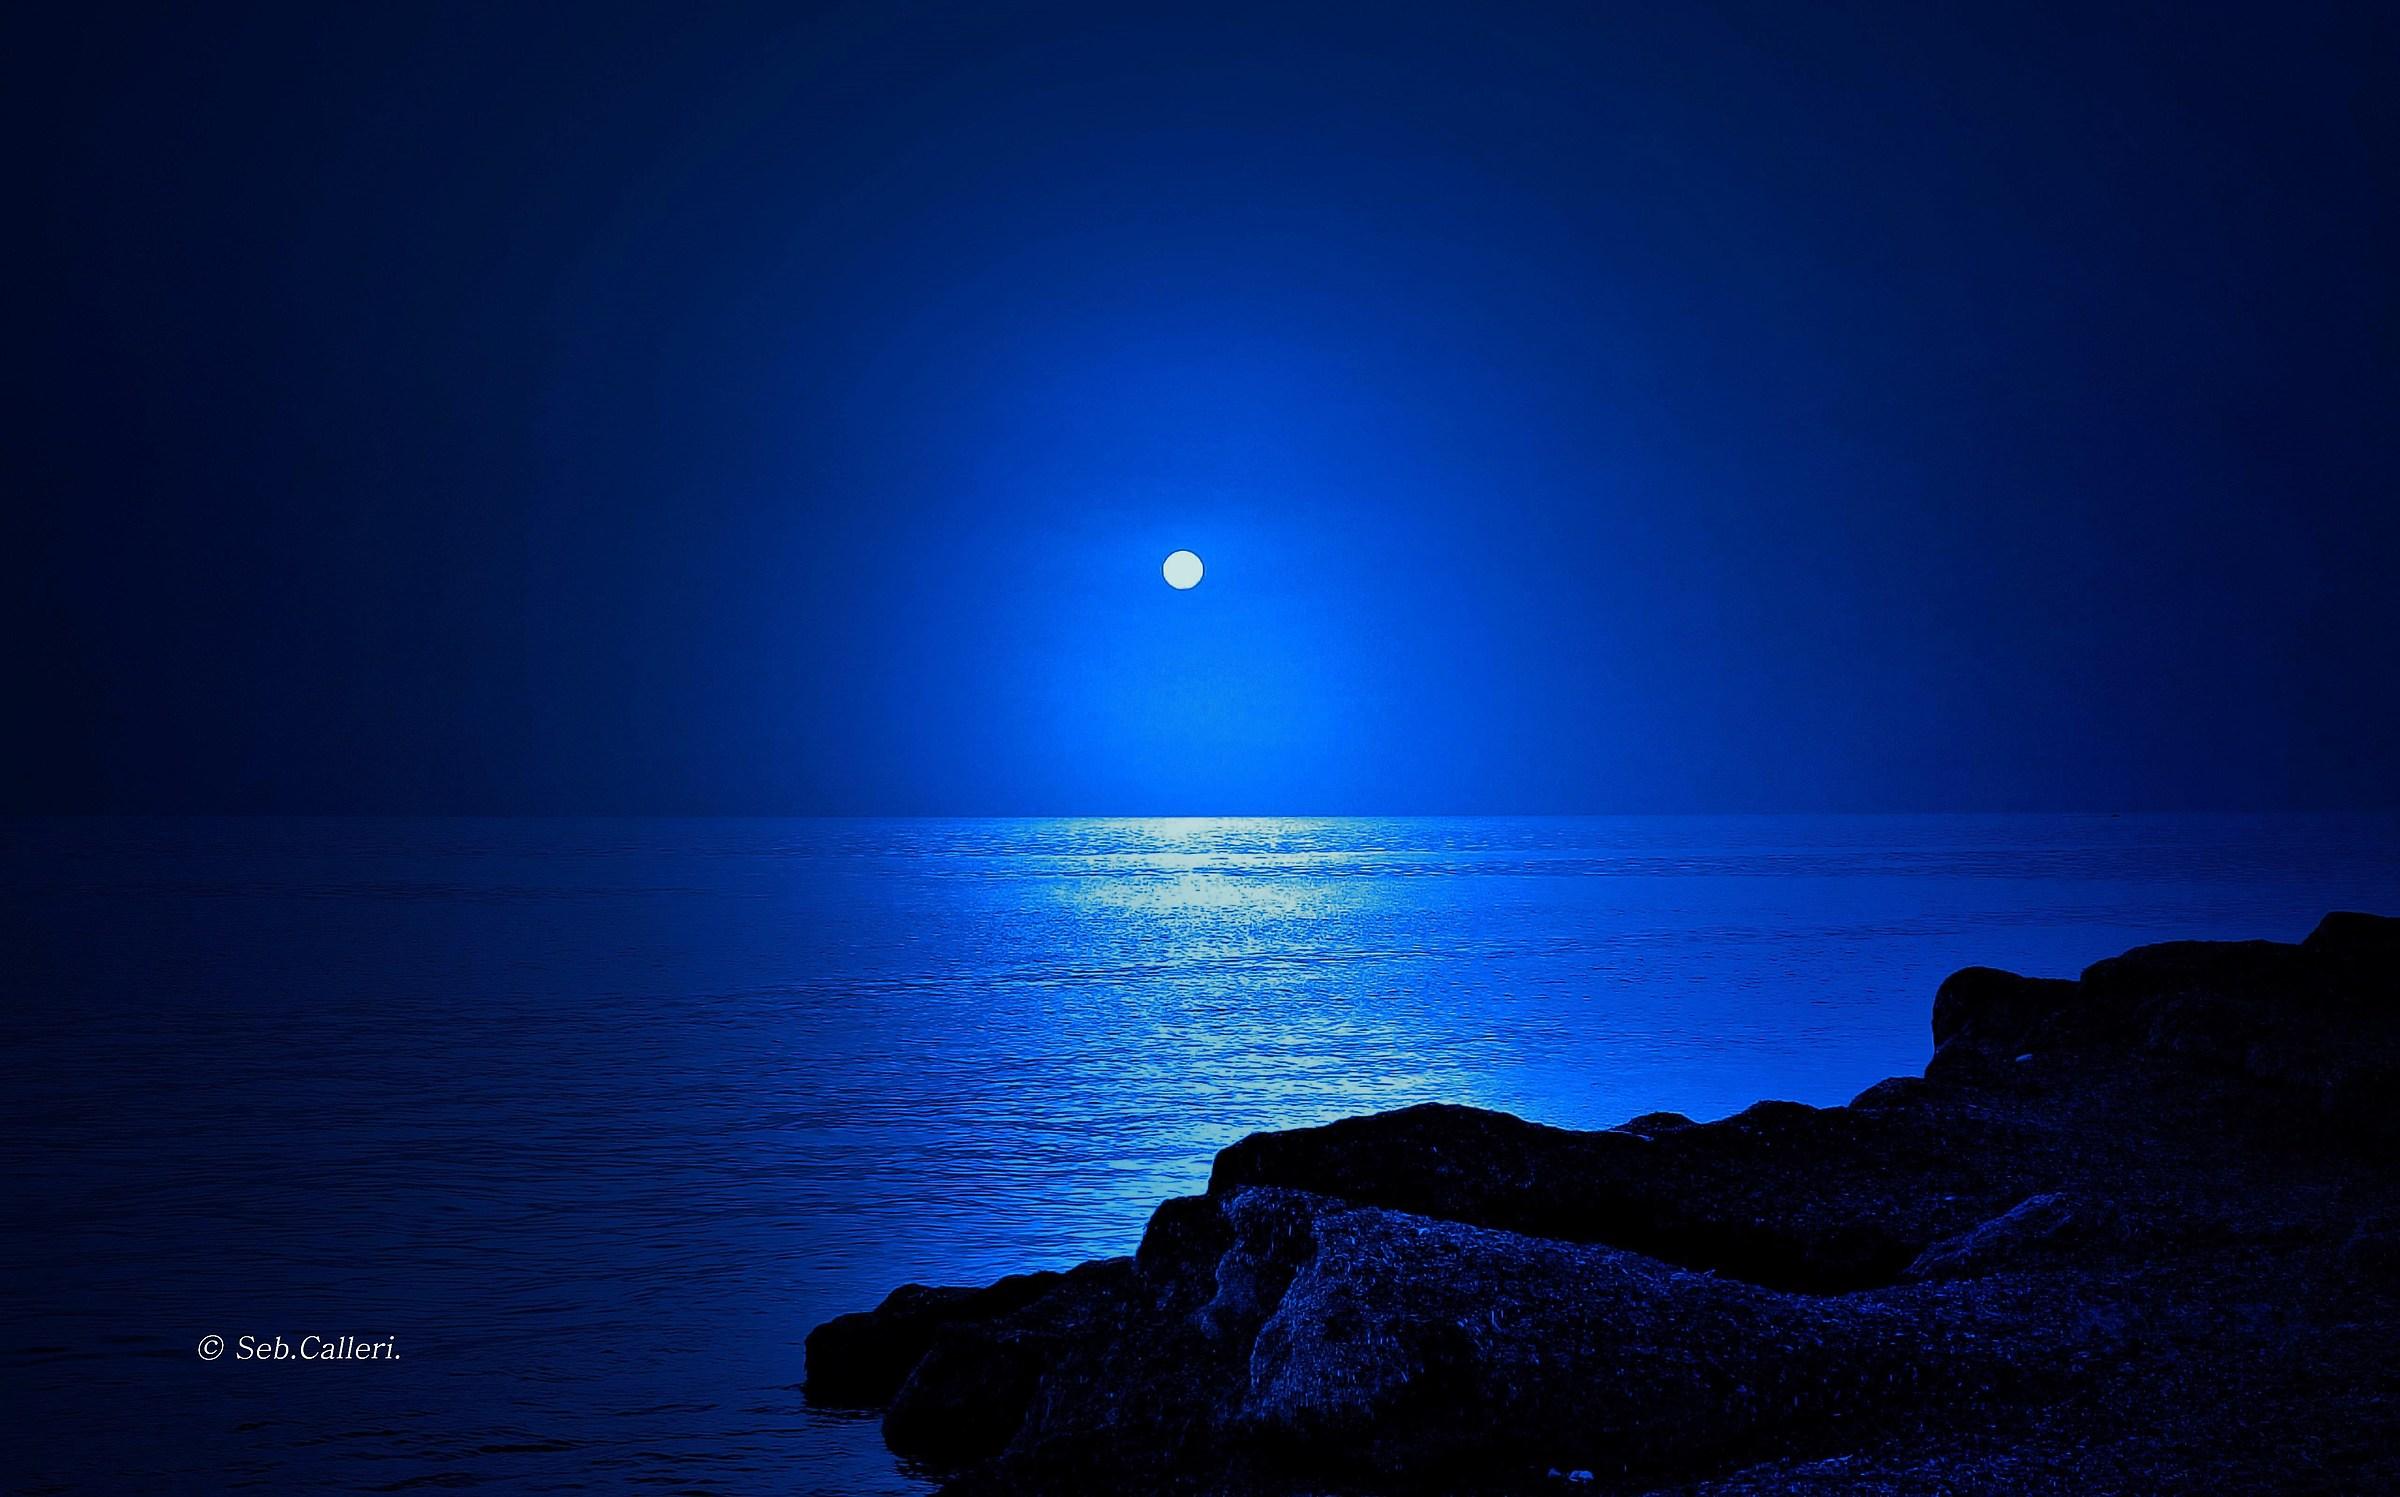 Night in the moonlight...